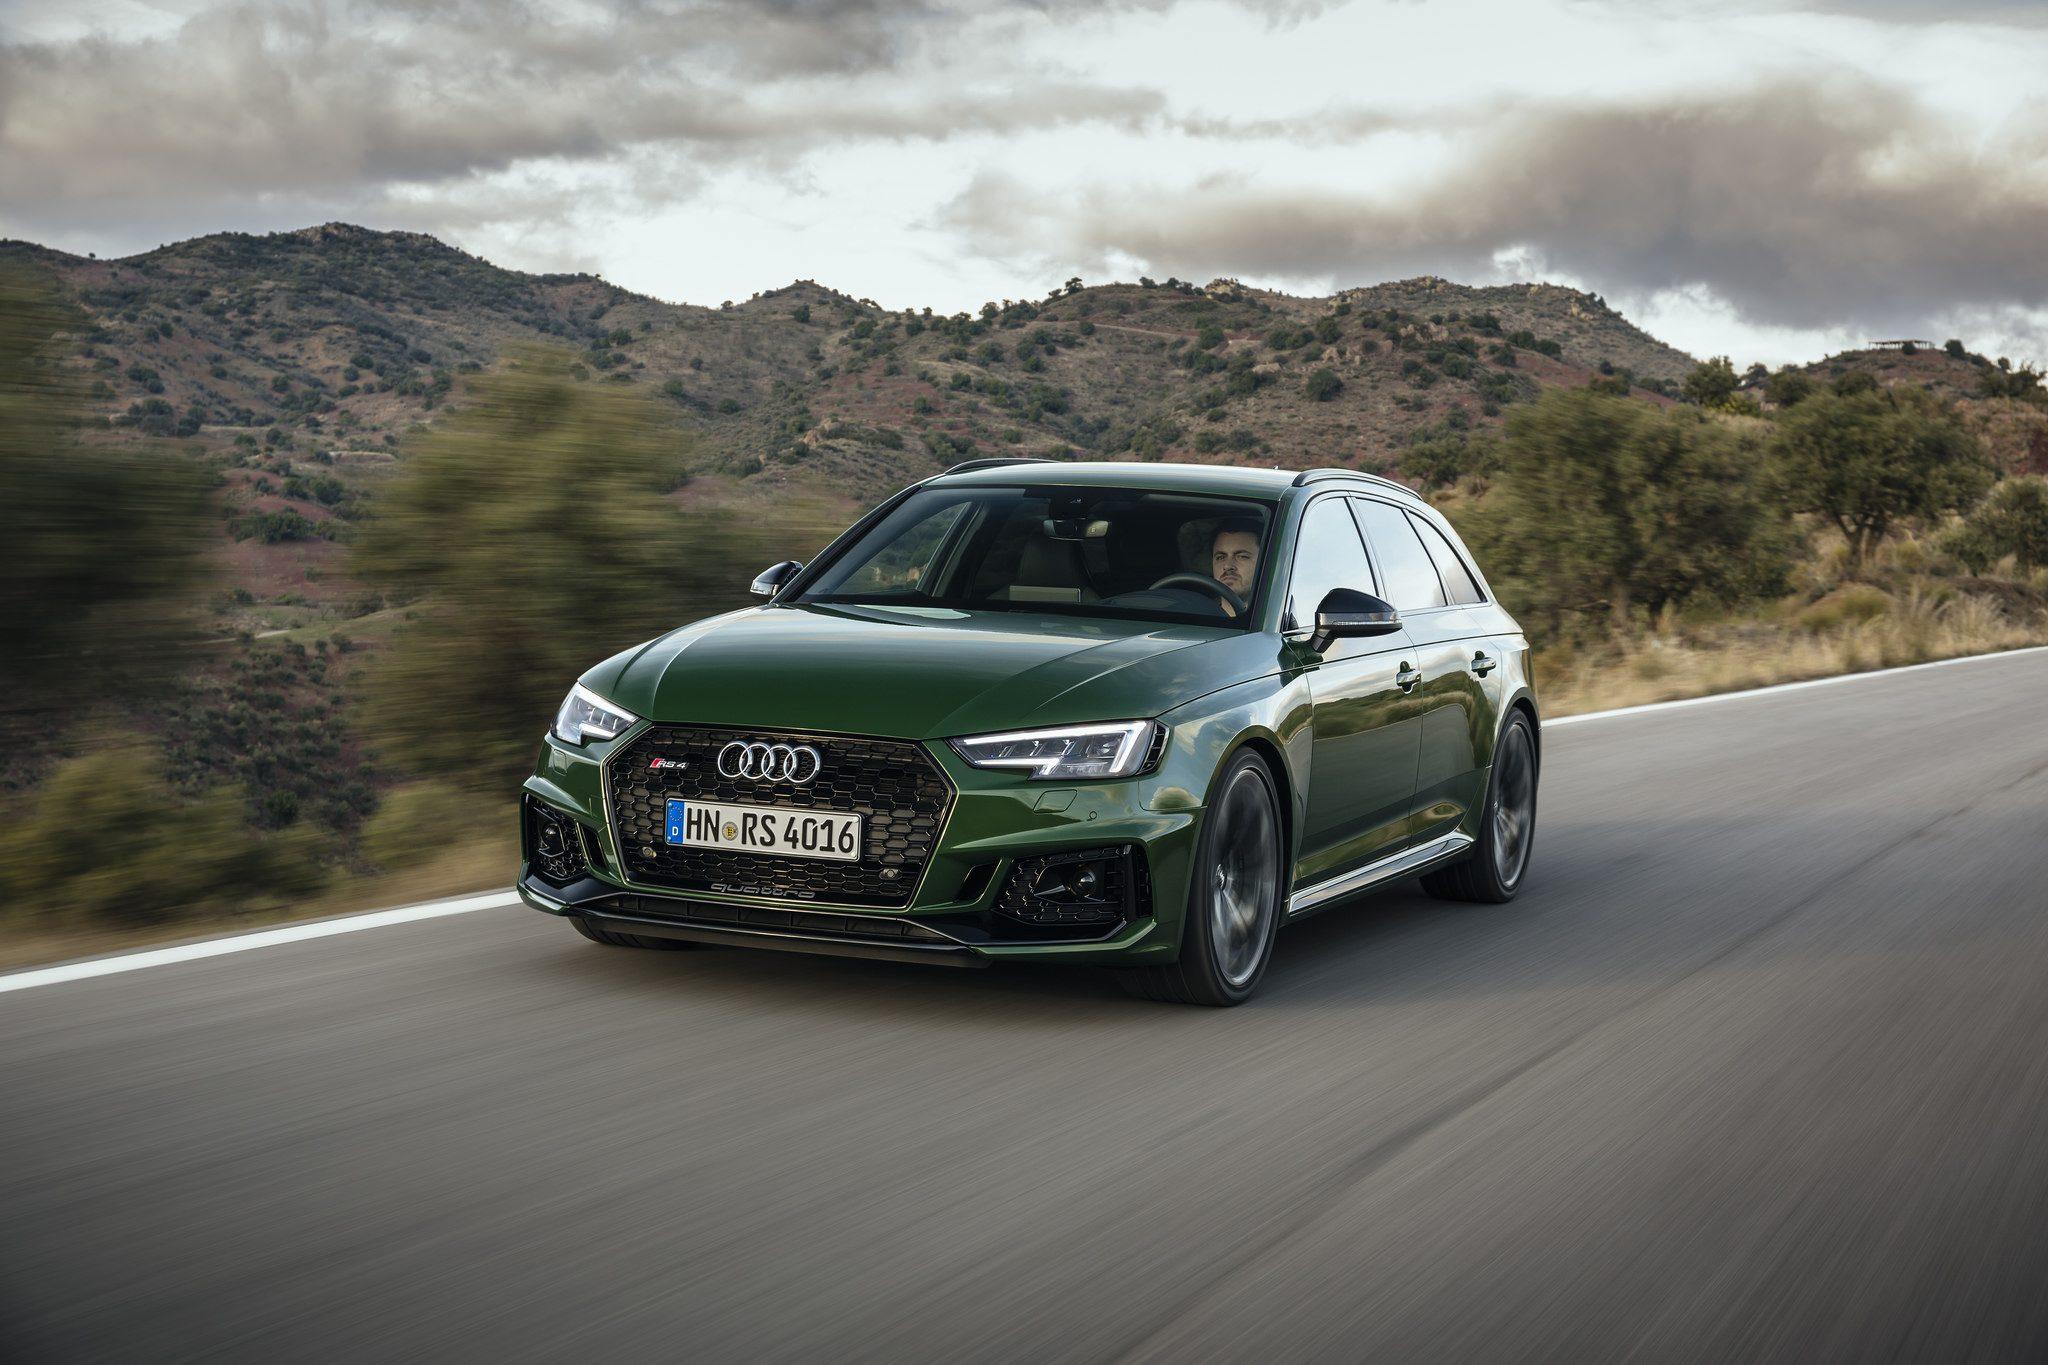 Audi RS 4 Avant Groen